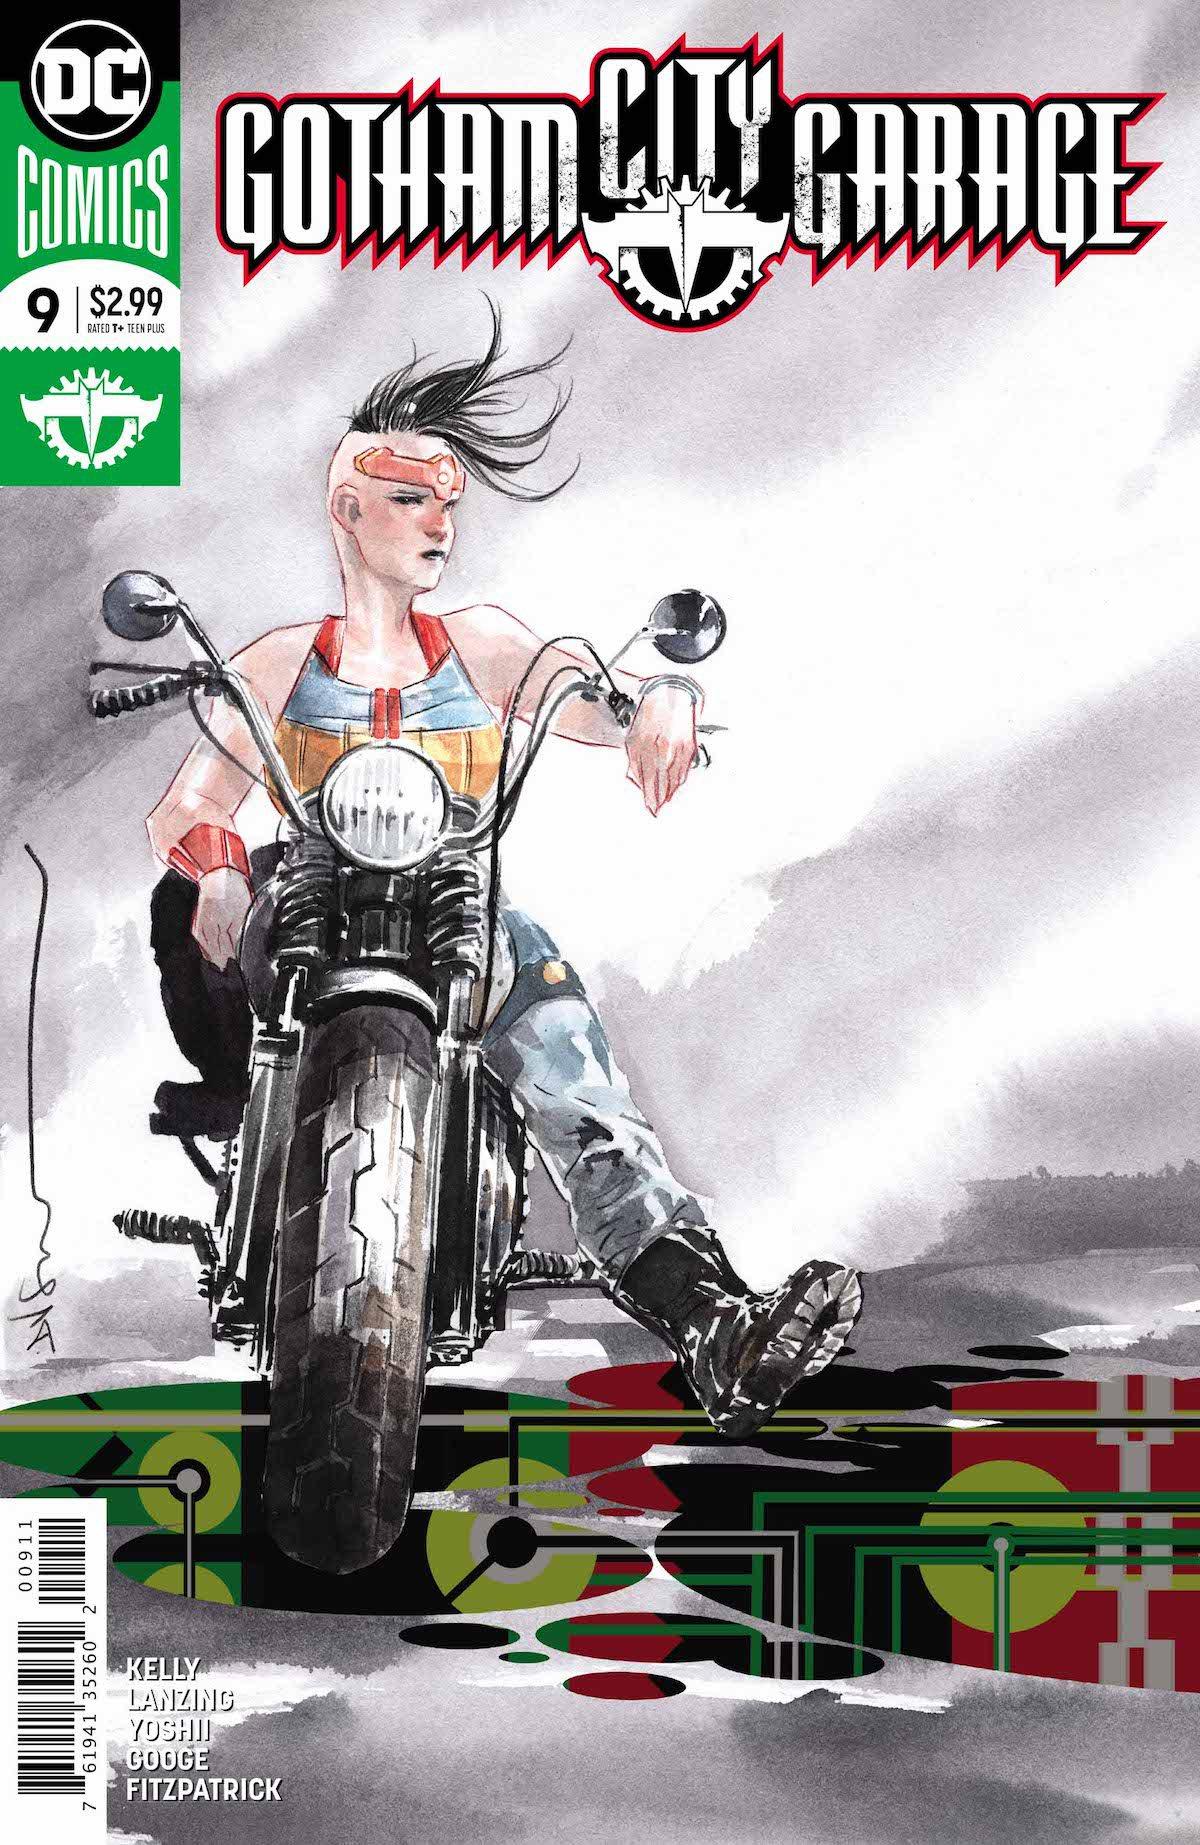 Gotham City Garage #9 cover